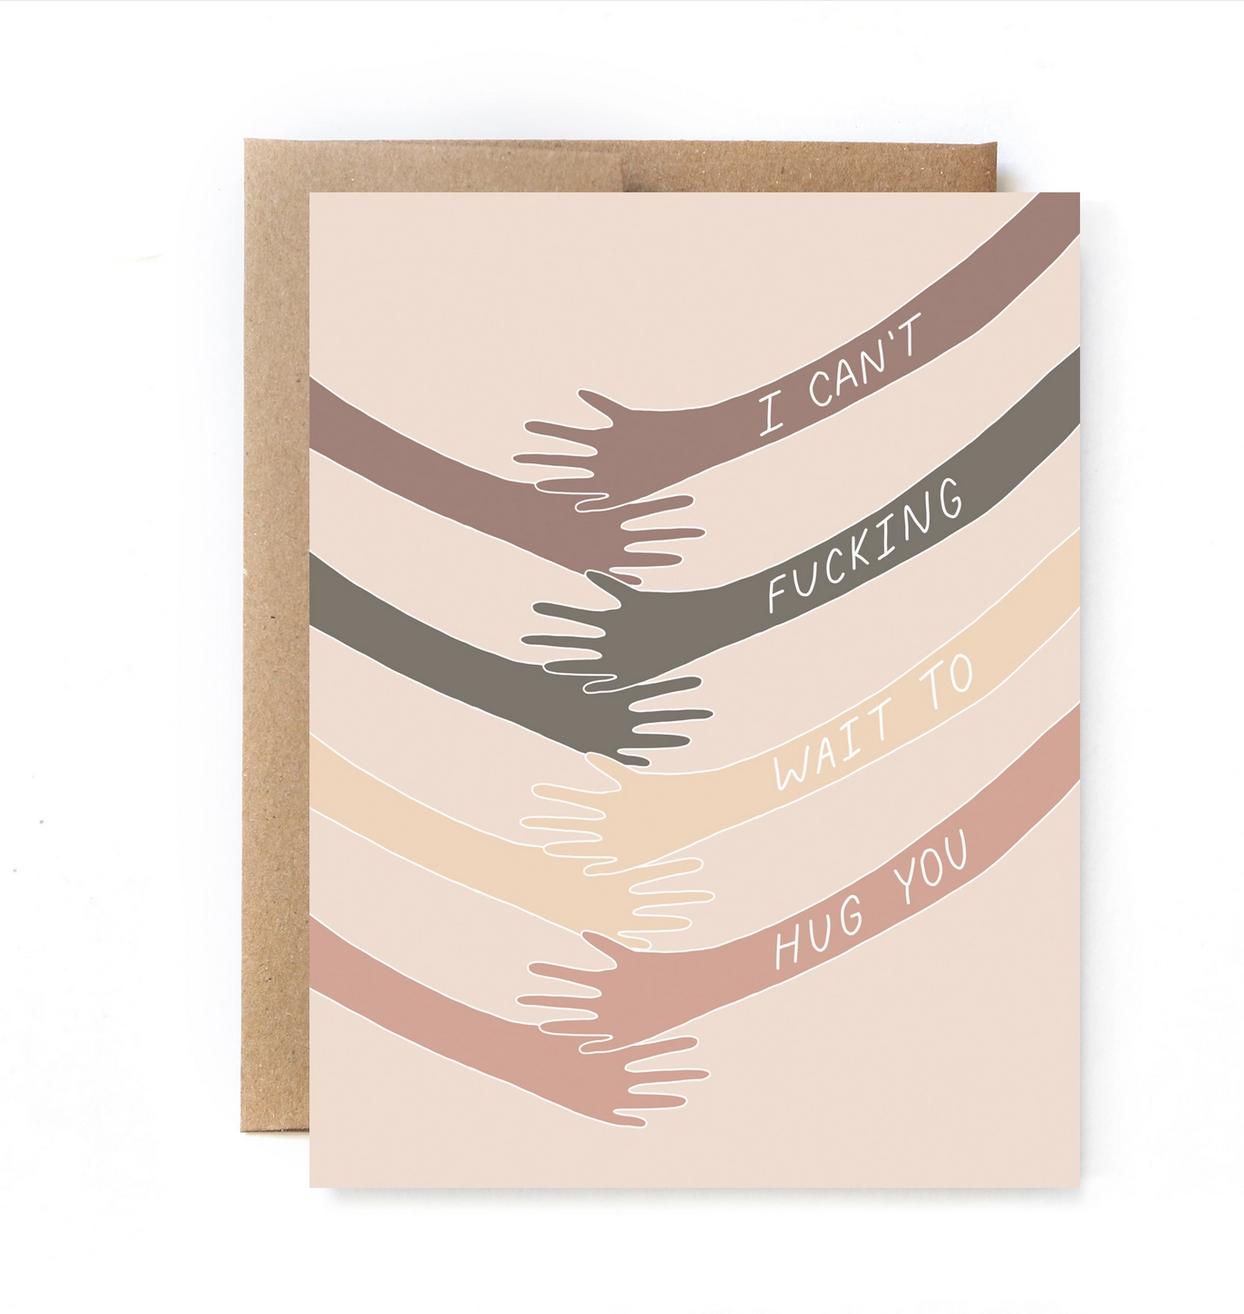 Unblushing Quarantine Card - Hug You